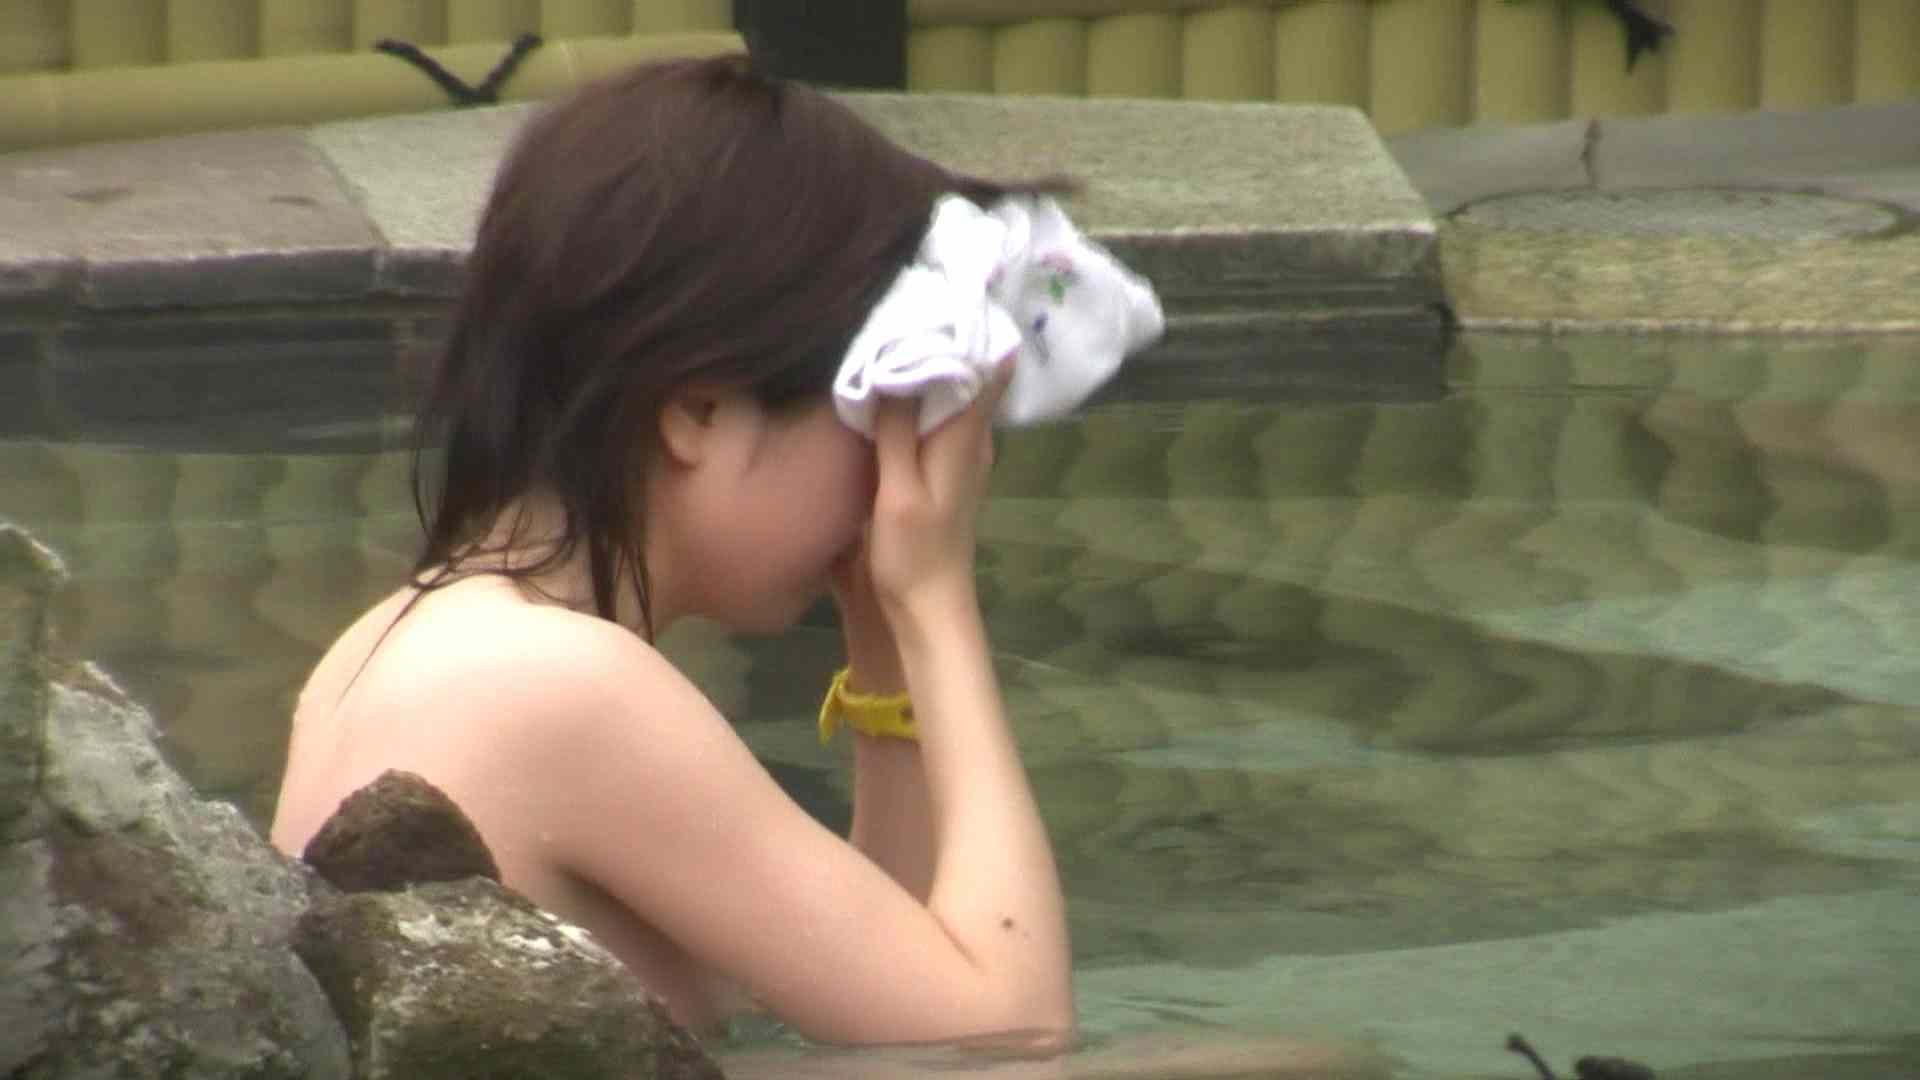 Aquaな露天風呂Vol.675 0   0  44連発 23